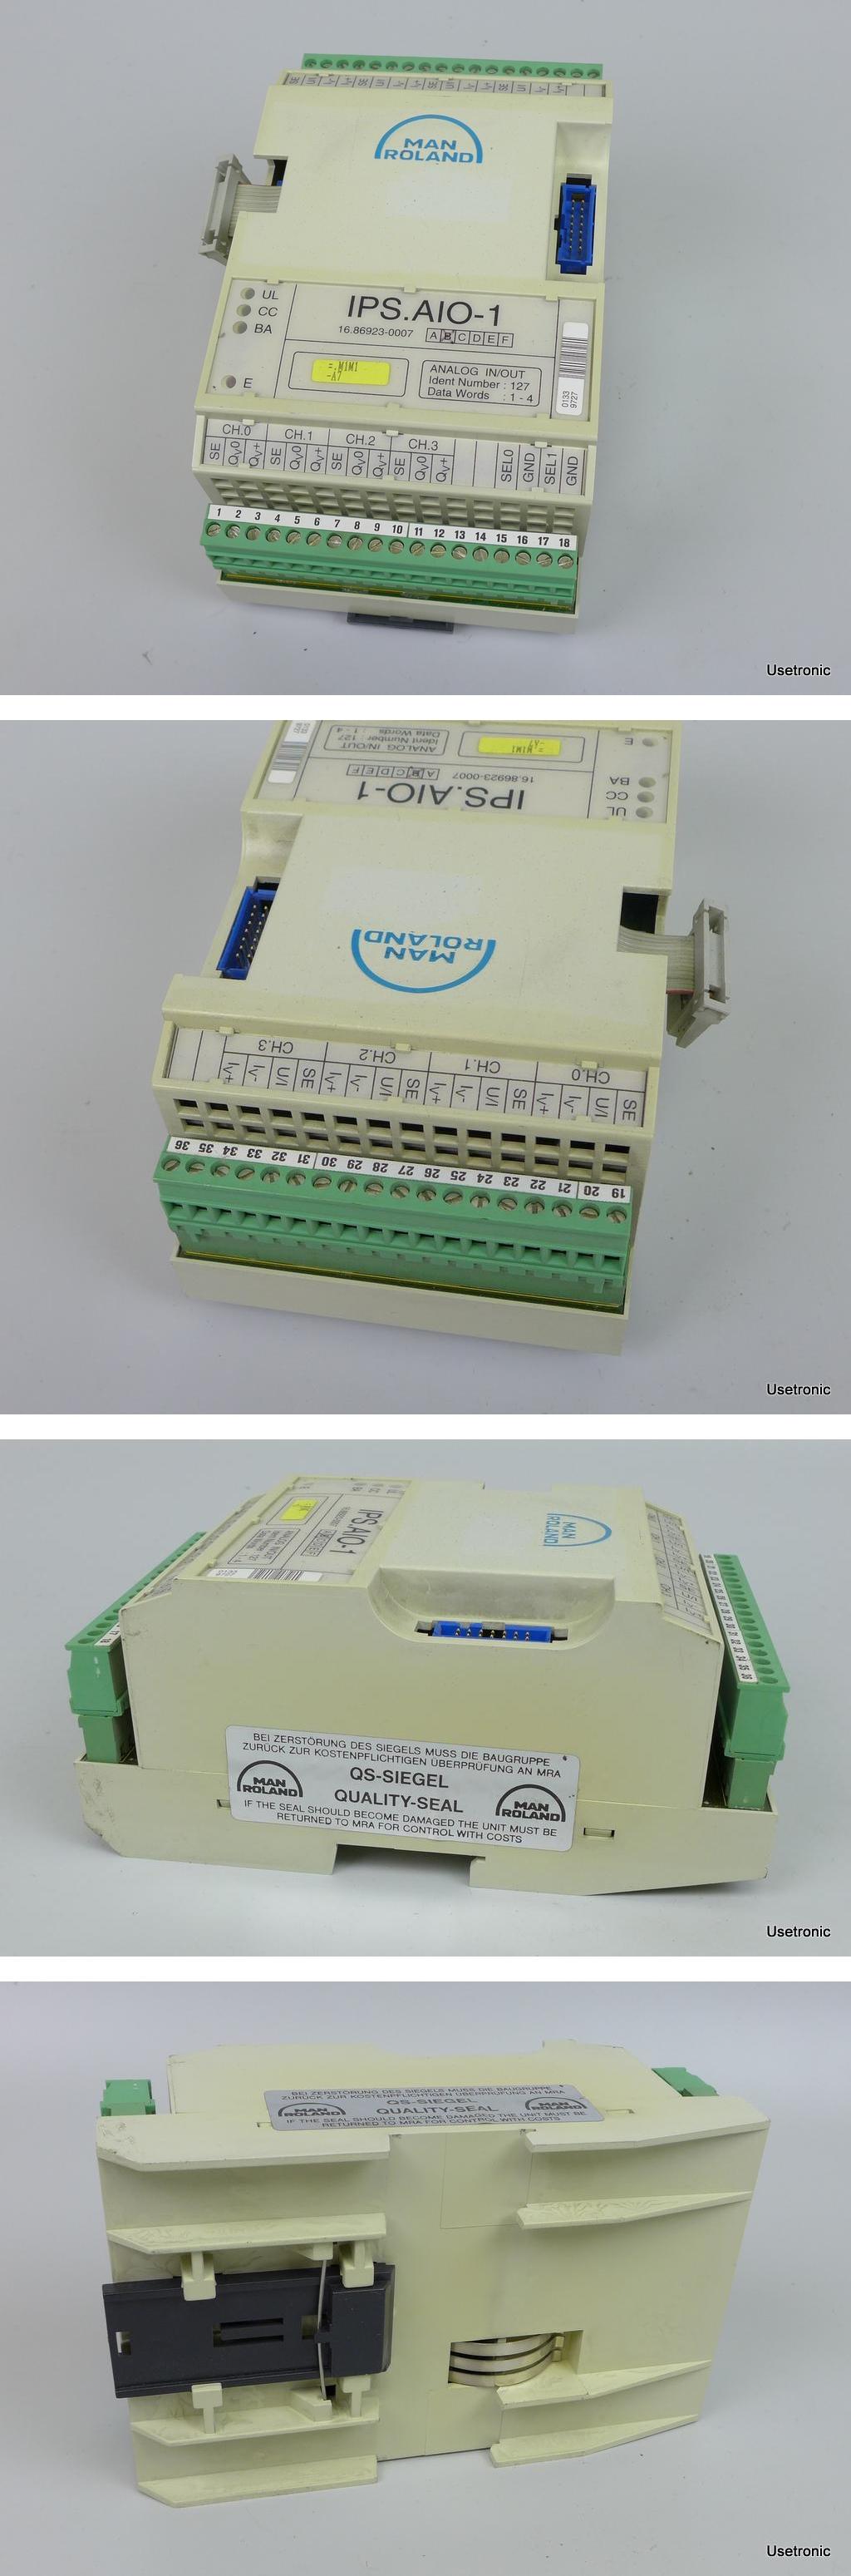 MAN Roland IPS.AIO-1 ai0-1 16.86923